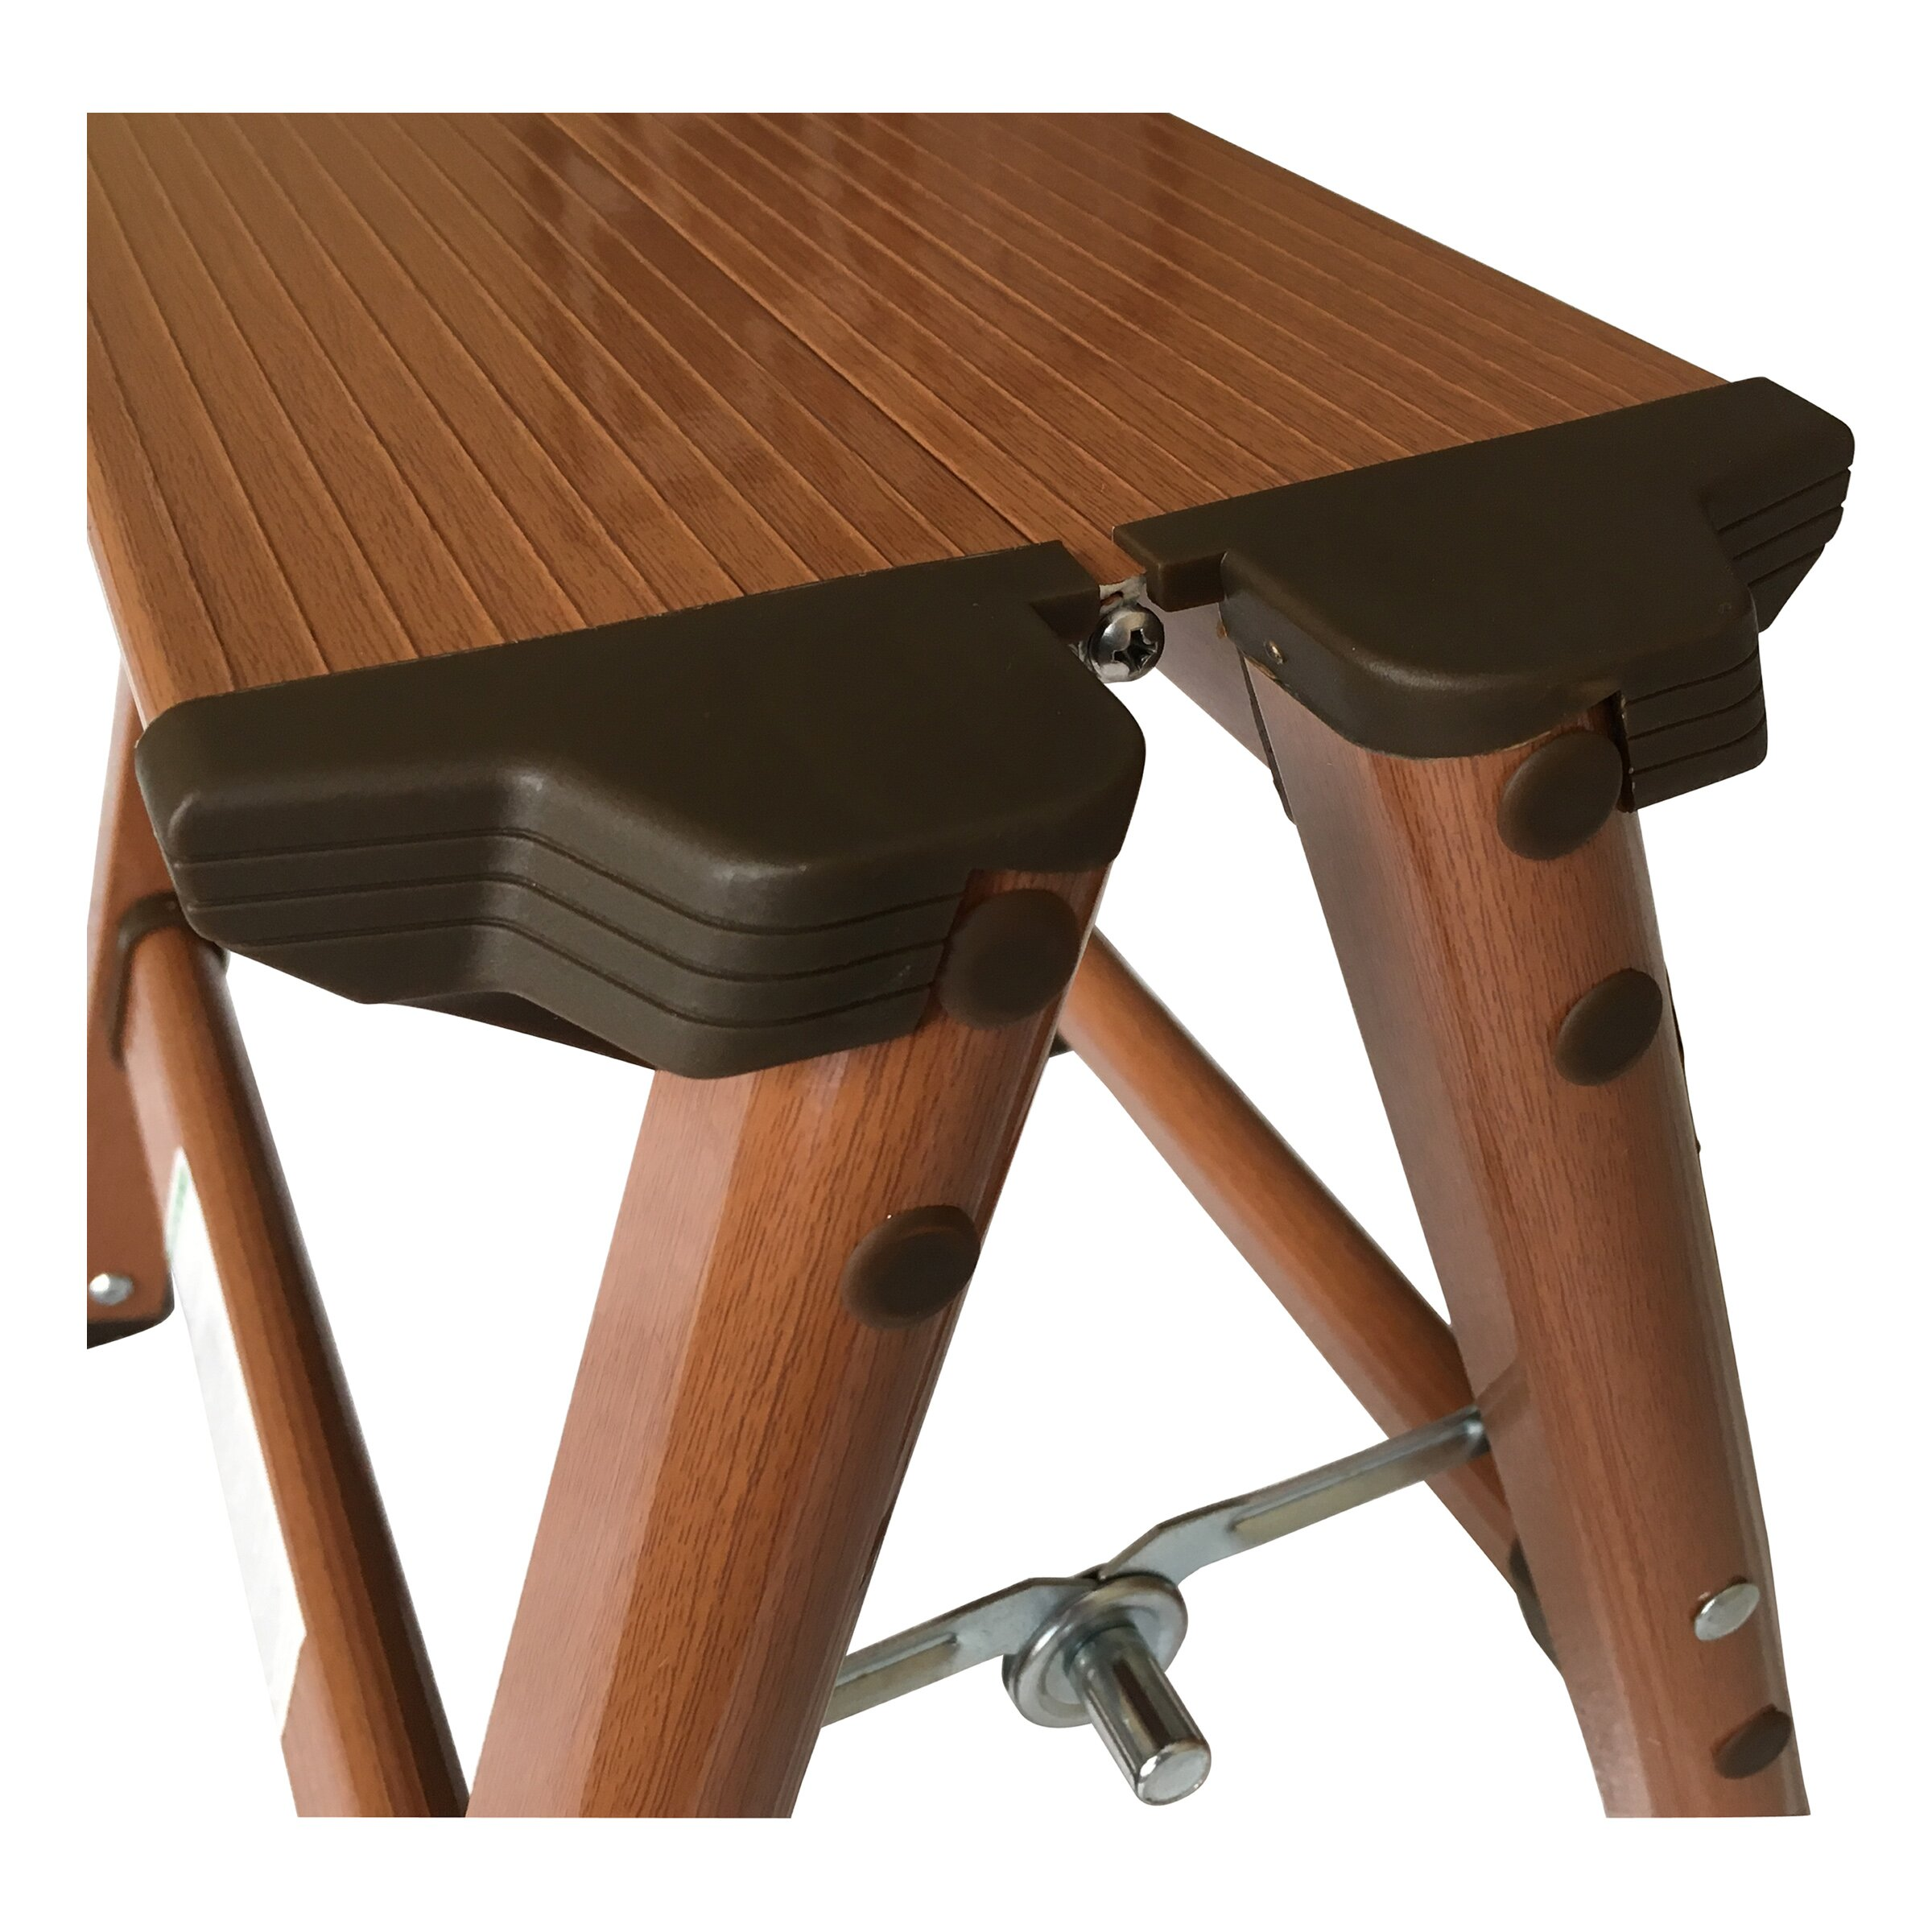 Amazing 1 Step Step Stool Step Stool Series Brewer Company Hailo Ibusinesslaw Wood Chair Design Ideas Ibusinesslaworg